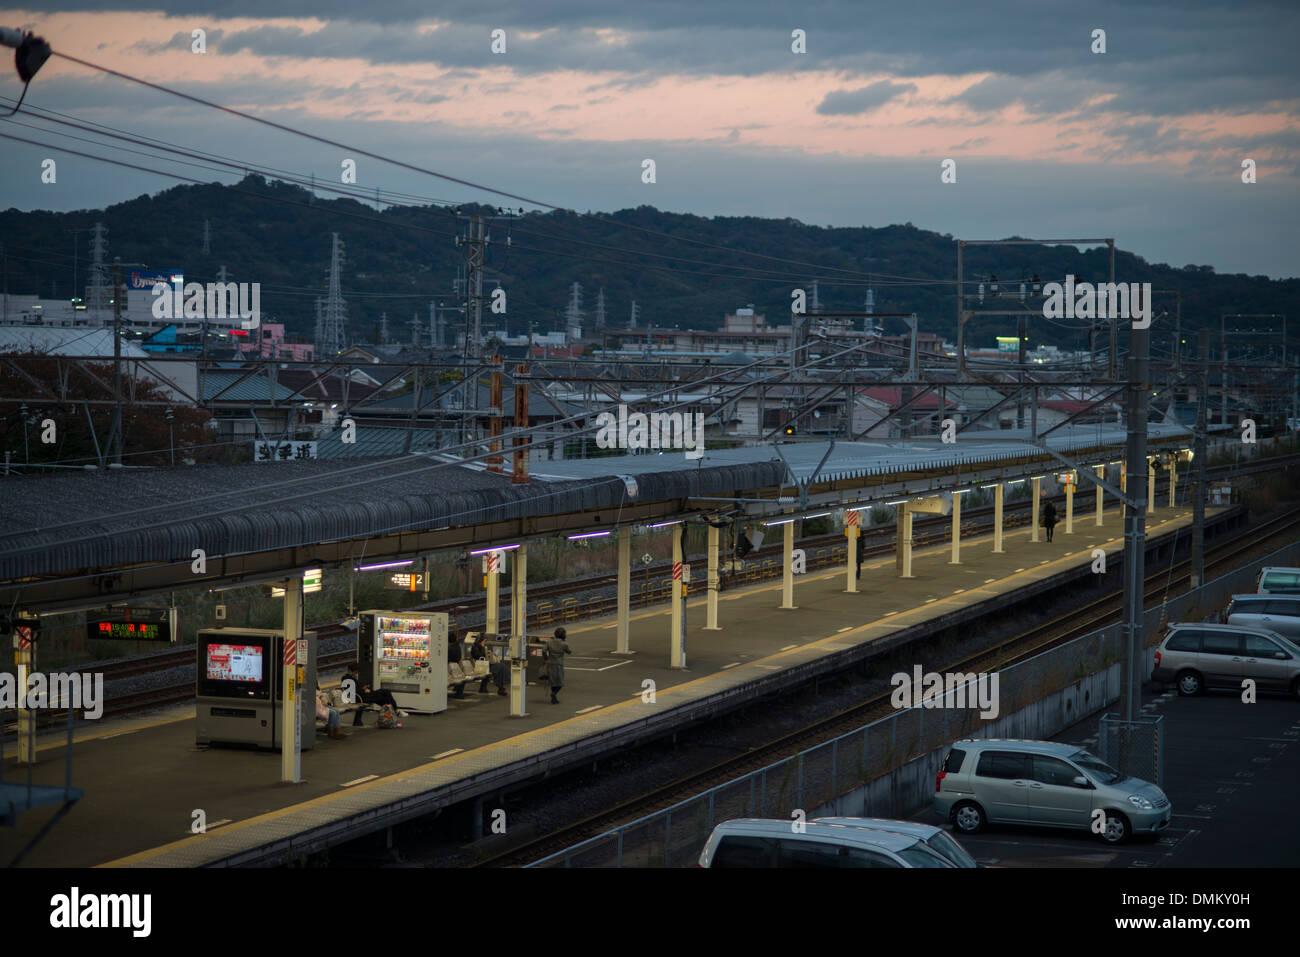 PAssengers await a train as the sun rises behind Odawara train station,  Kanagawa Prefecture, Tokyo, Japan - Stock Image